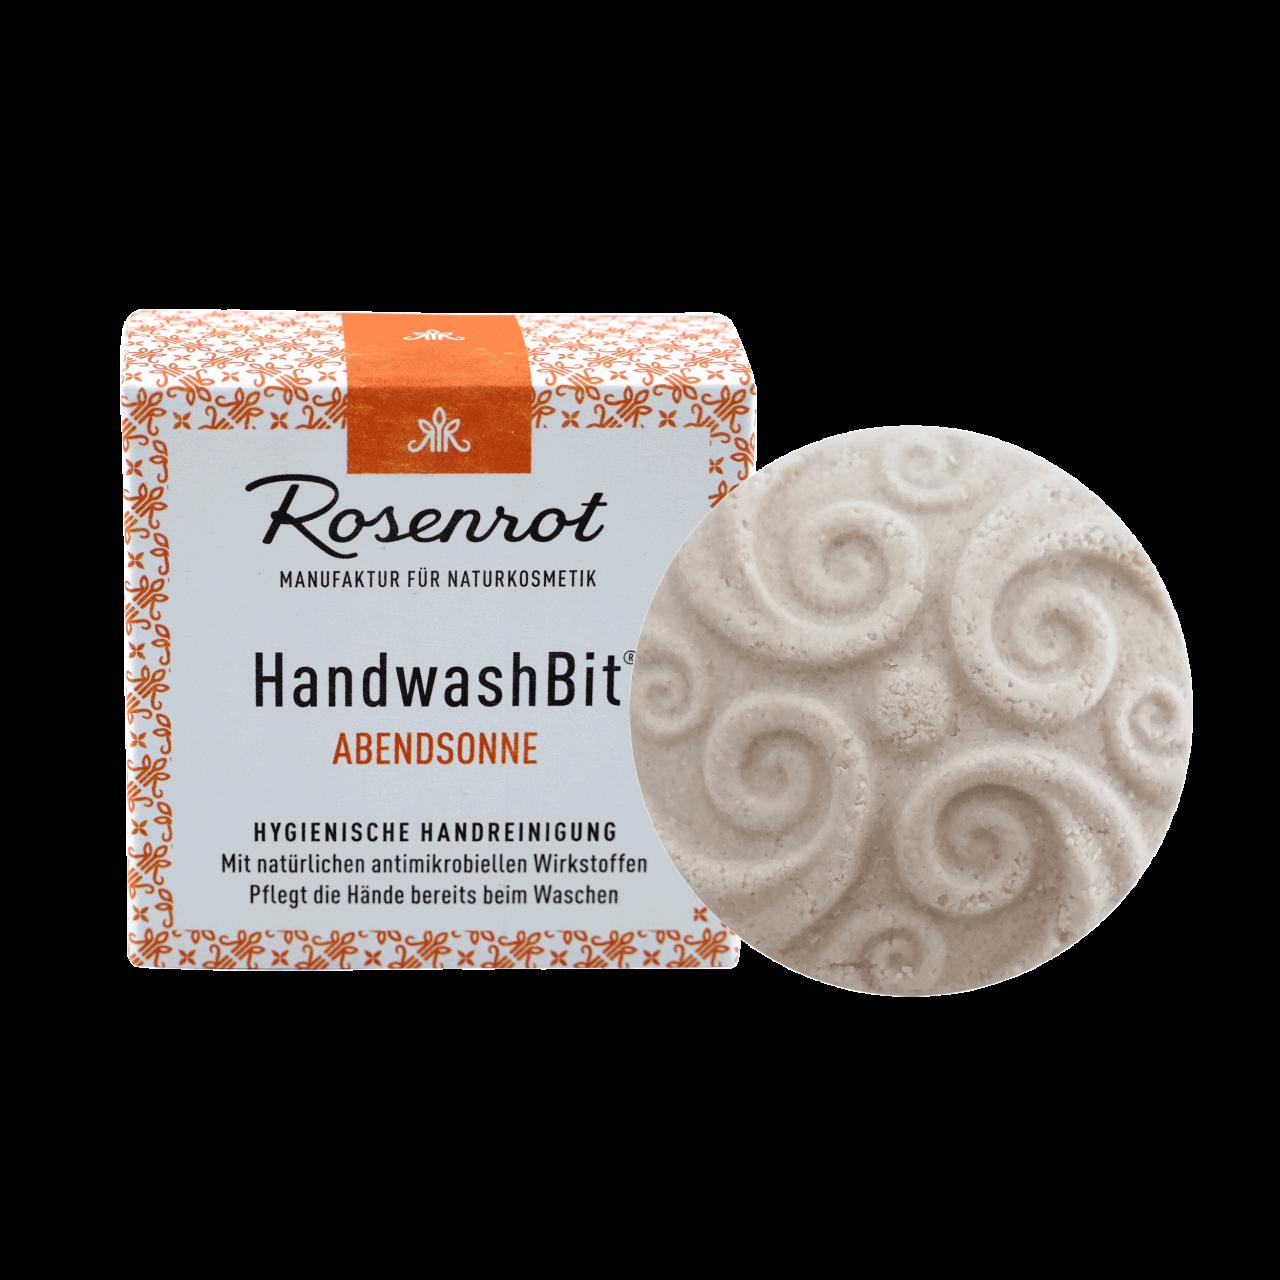 HandwashBit® - solid wash lotion Evening Sun